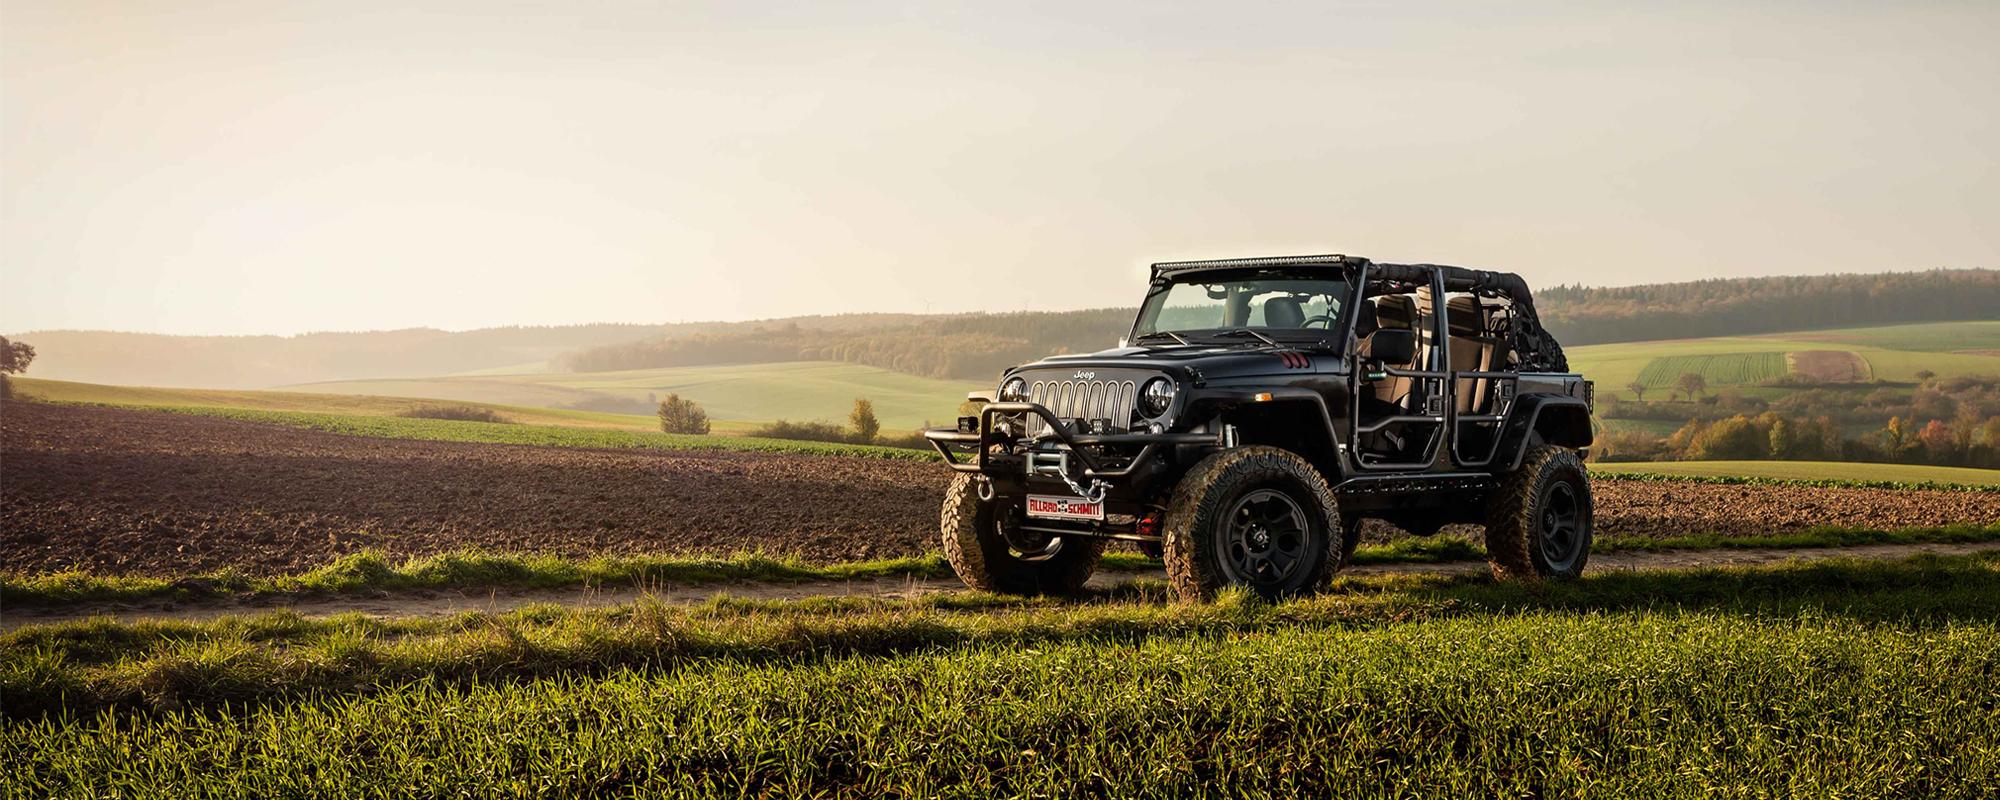 Umgebauter Jeep Wrangler JK auf einem Feld